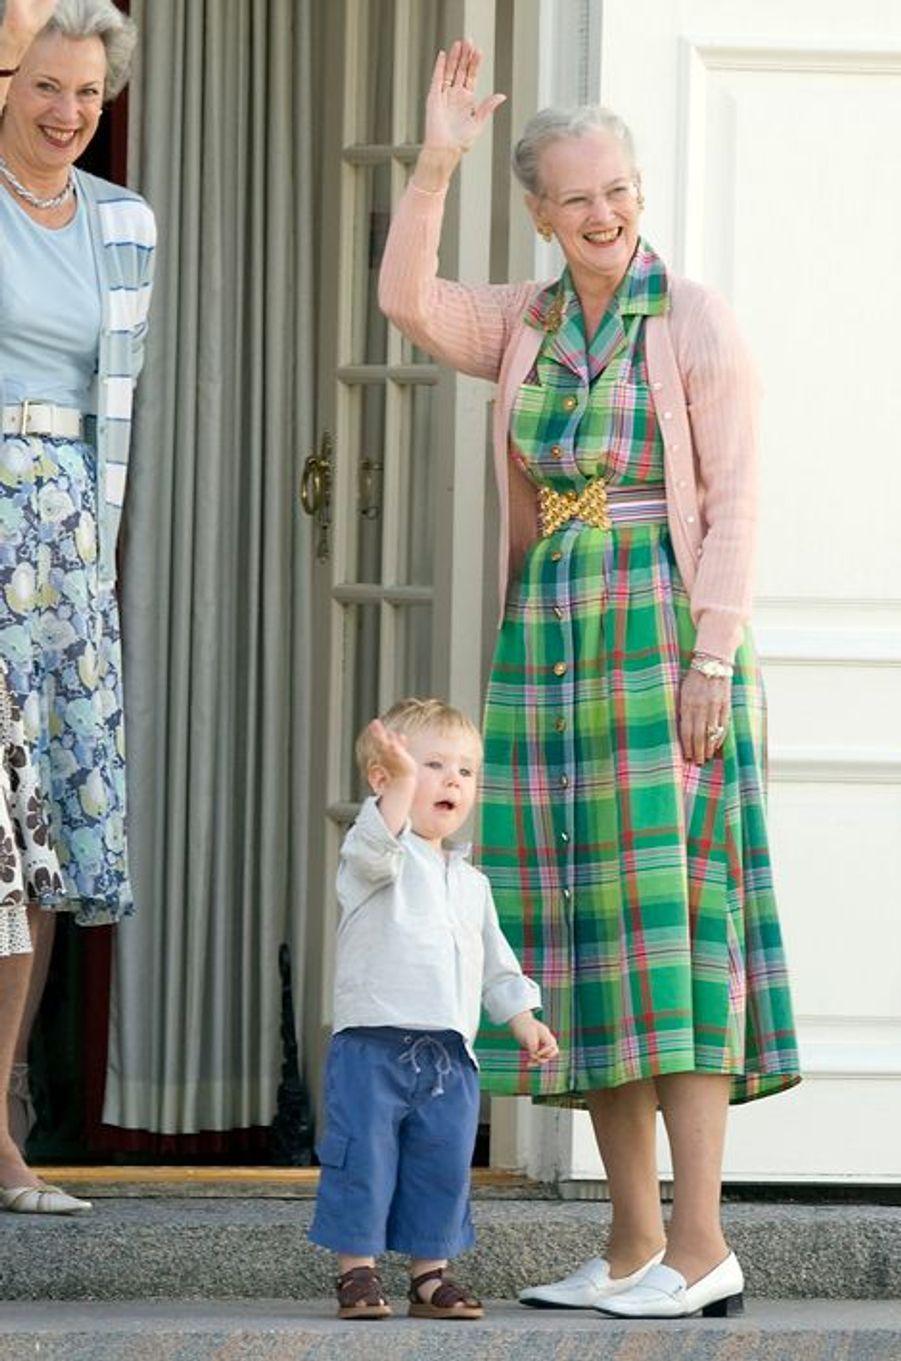 Le prince Christian de Danemark avec la reine Margrethe II le 3 août 2007